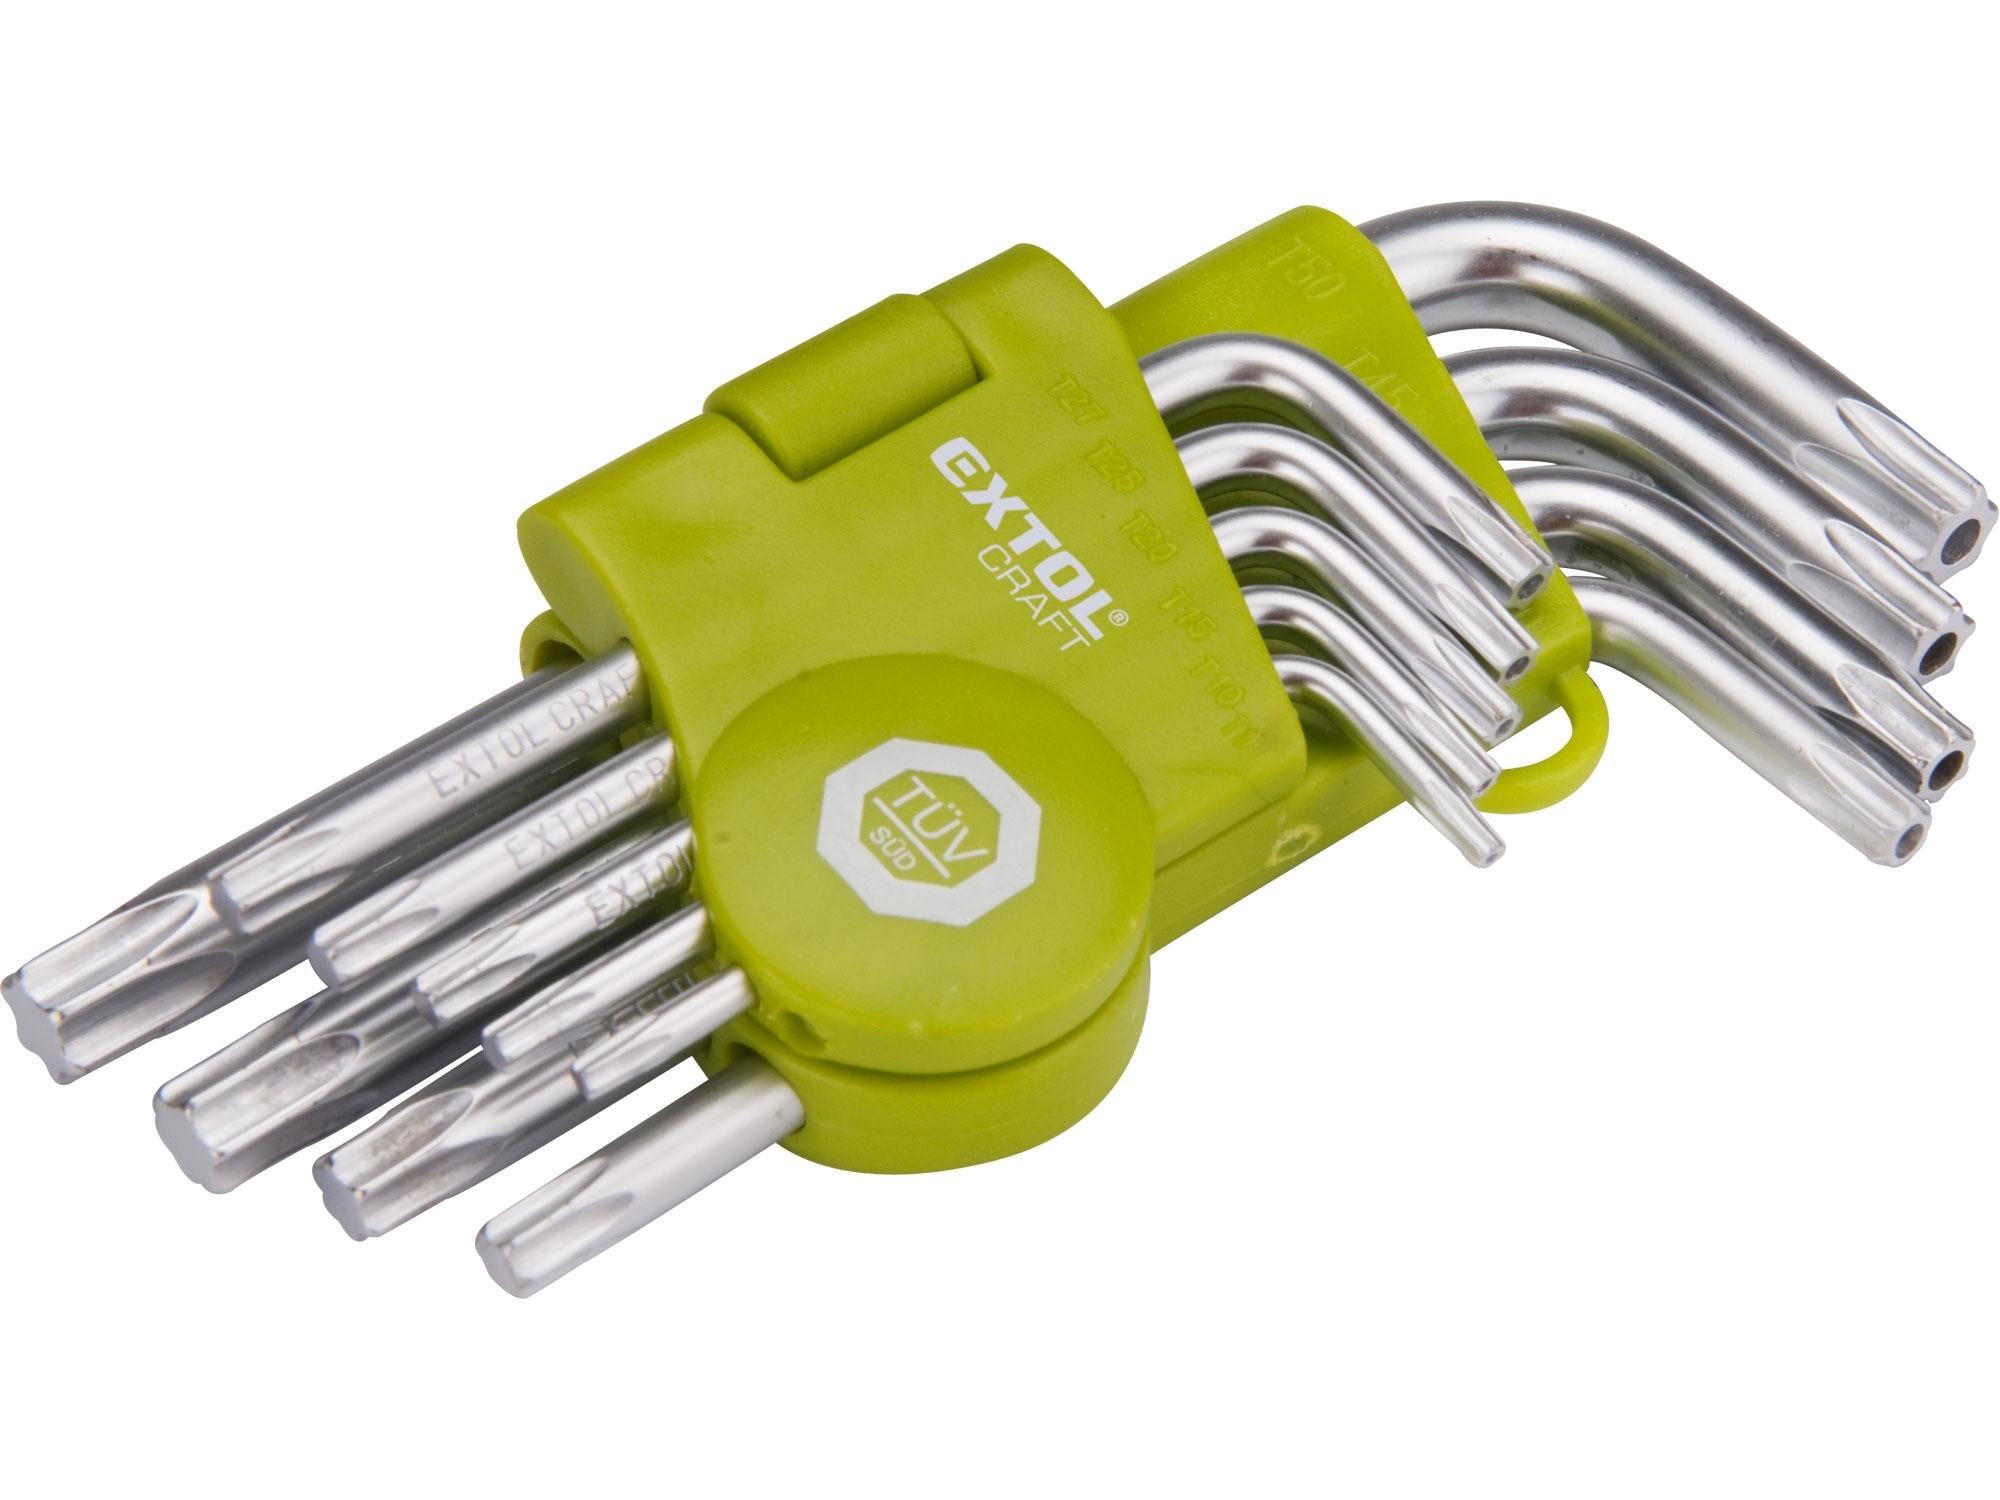 L-klíče TORX, sada 9ks, T 10-50, krátké